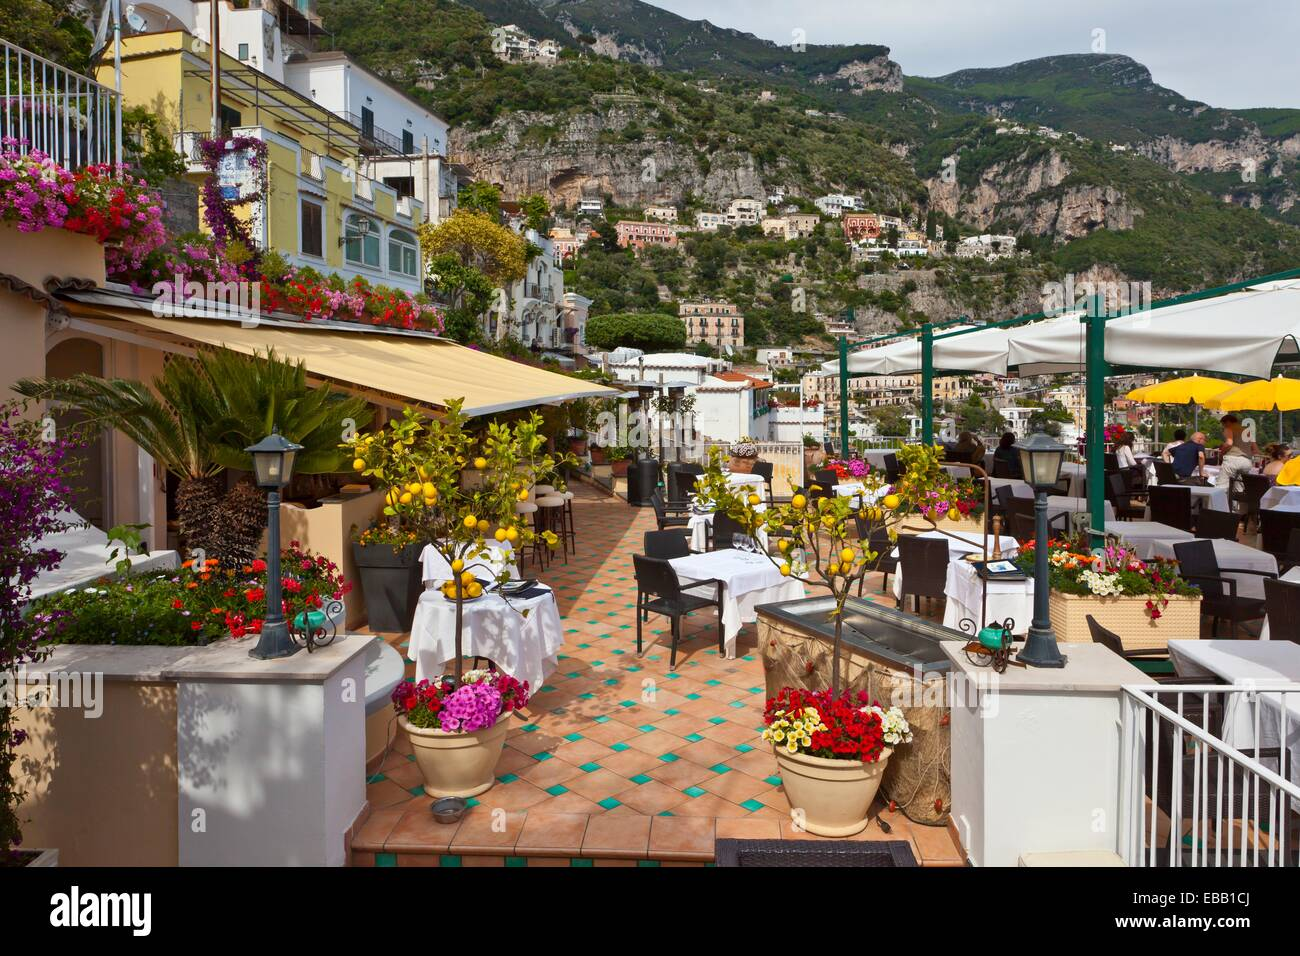 A restaurant in positano amalfi coast italy stock photo for Amalfi coast cuisine